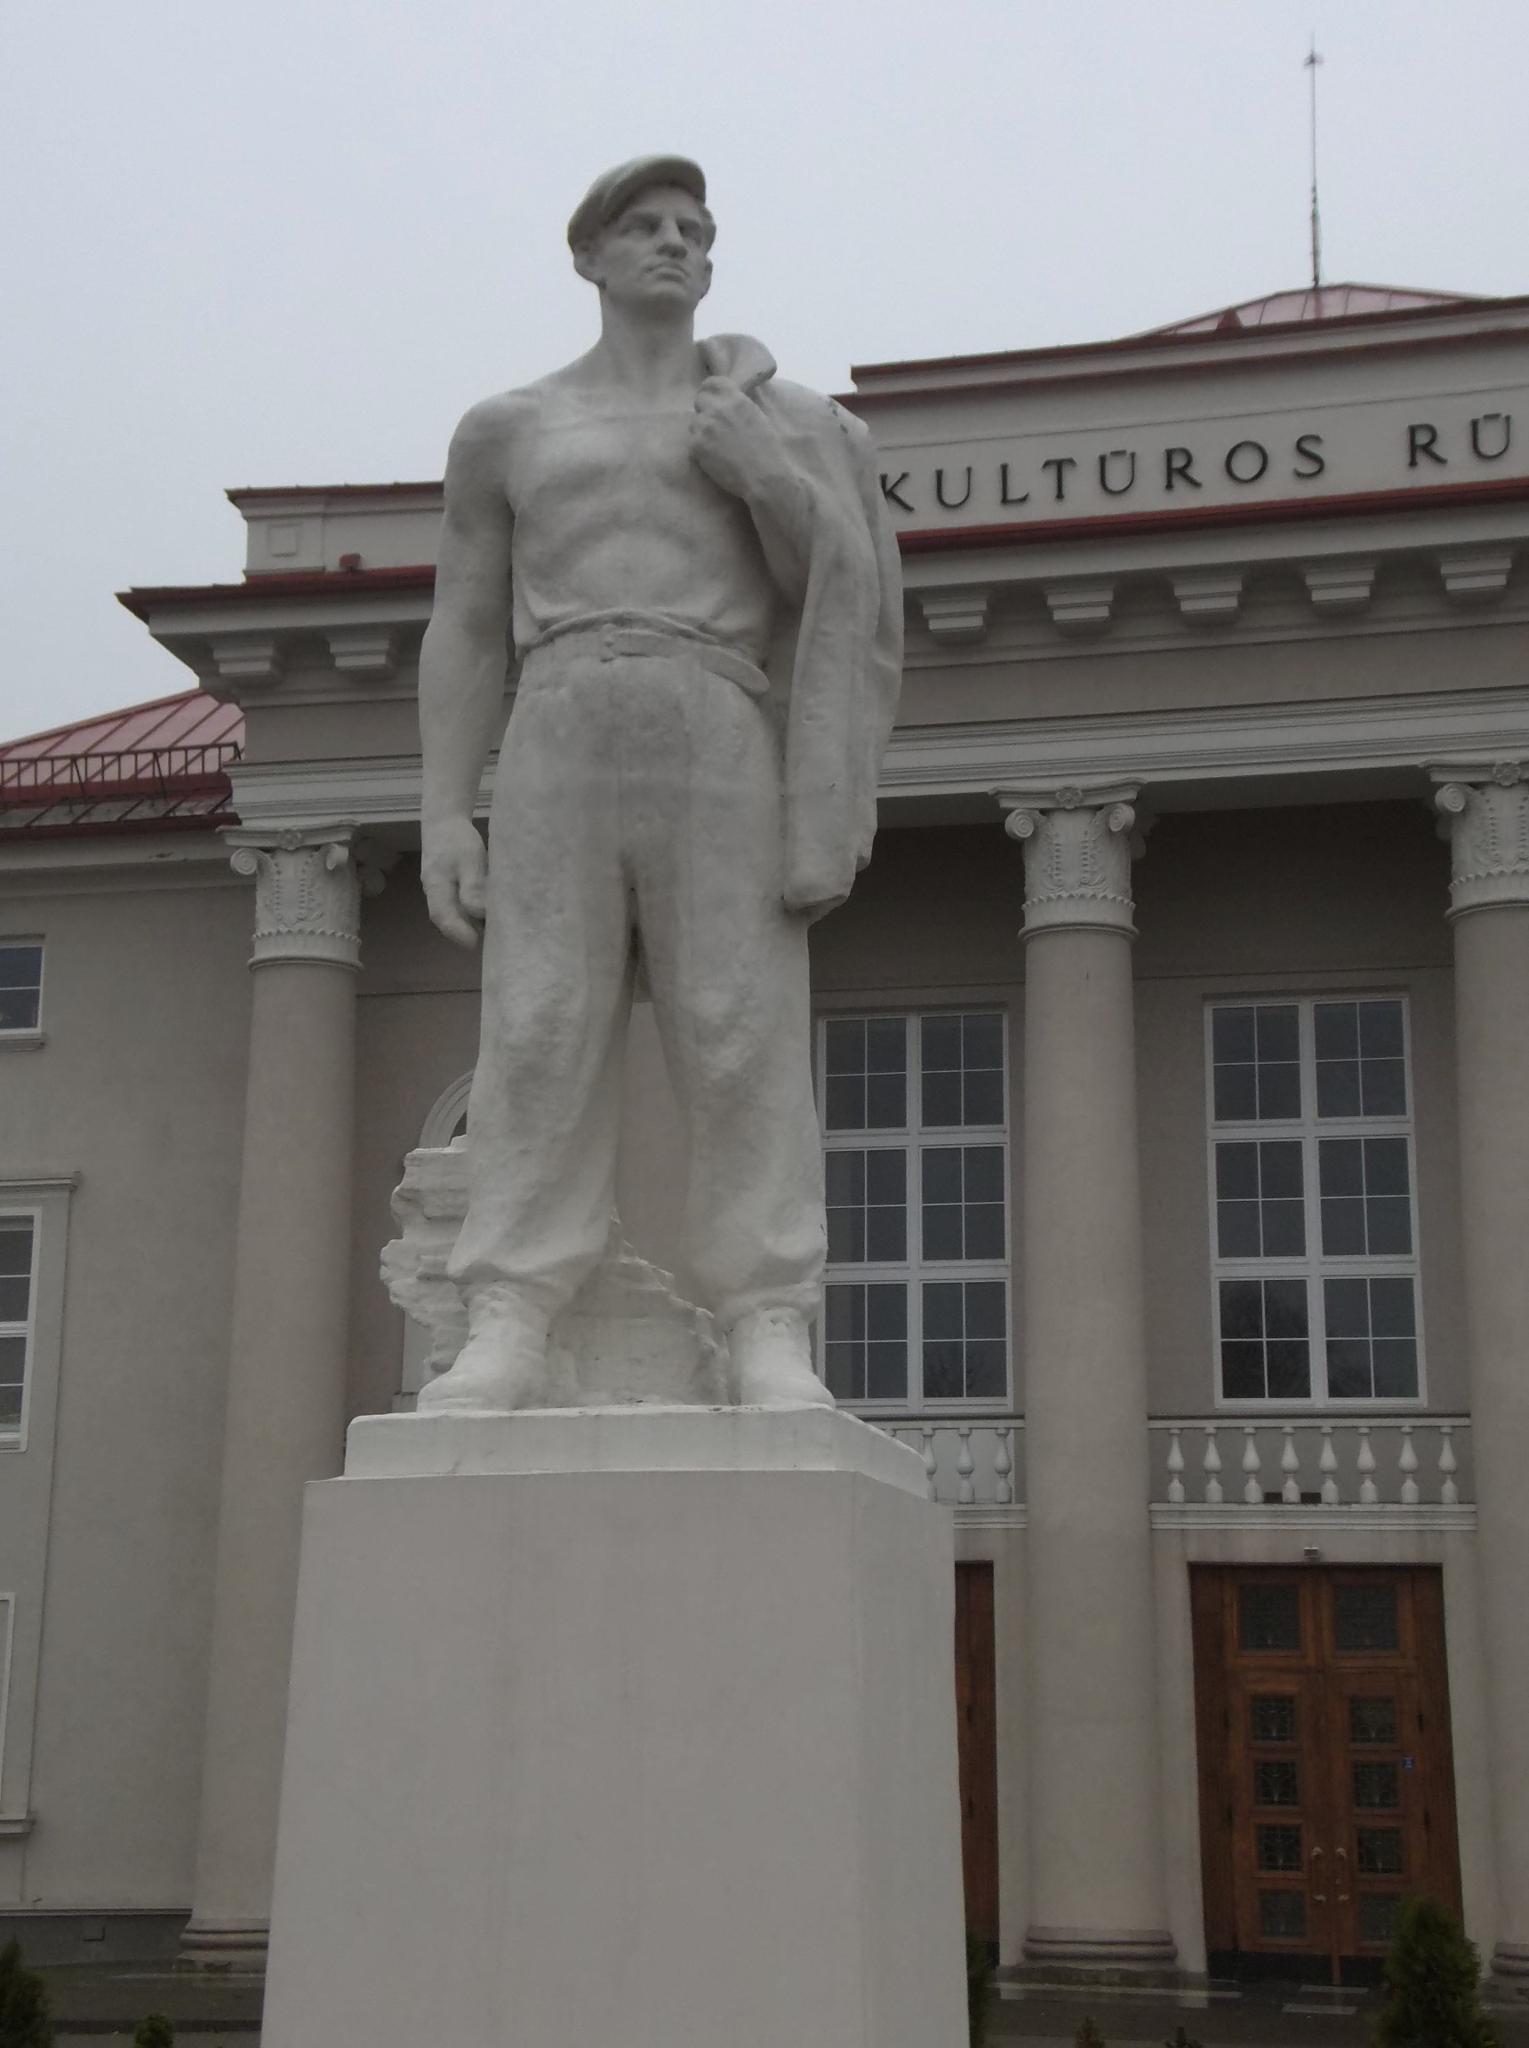 Sculpture by Zita Užkuraitienė